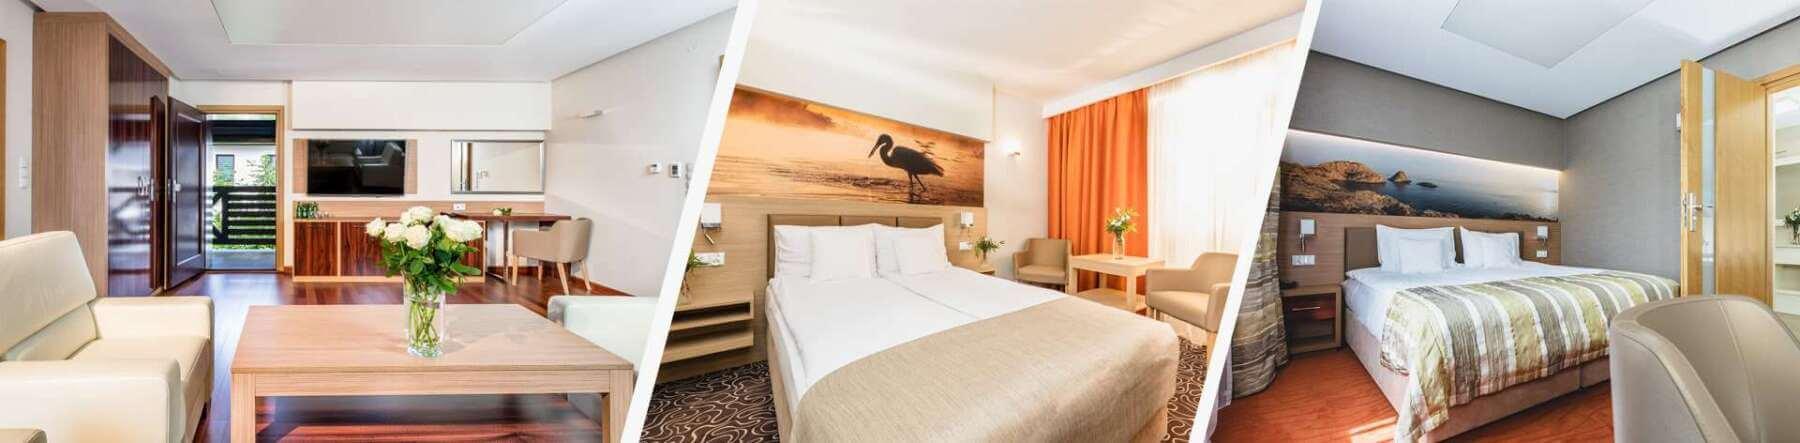 Hotel Amazonka Ciechocinek